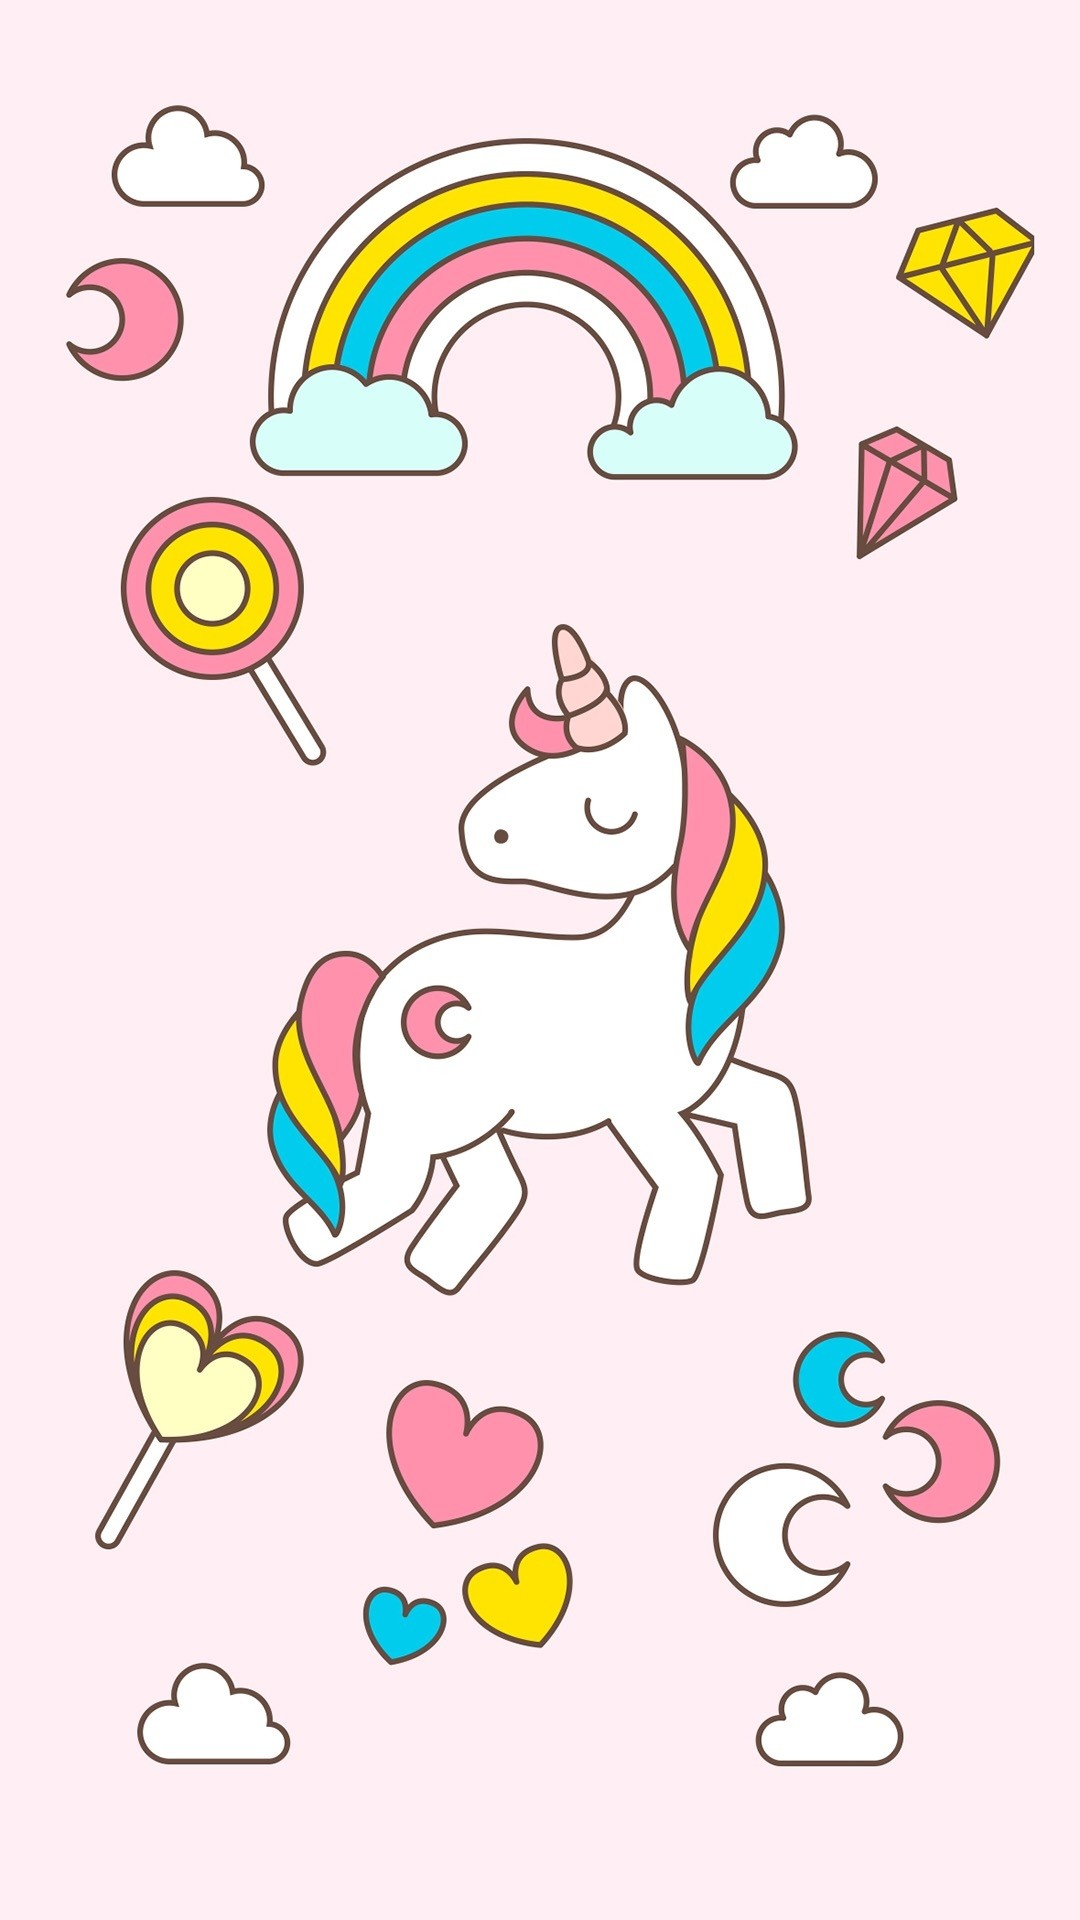 Res: 1080x1920, Simple Wallpaper Cartoon Kawaii - unicorn-cartoon-images-3-c-unicorn